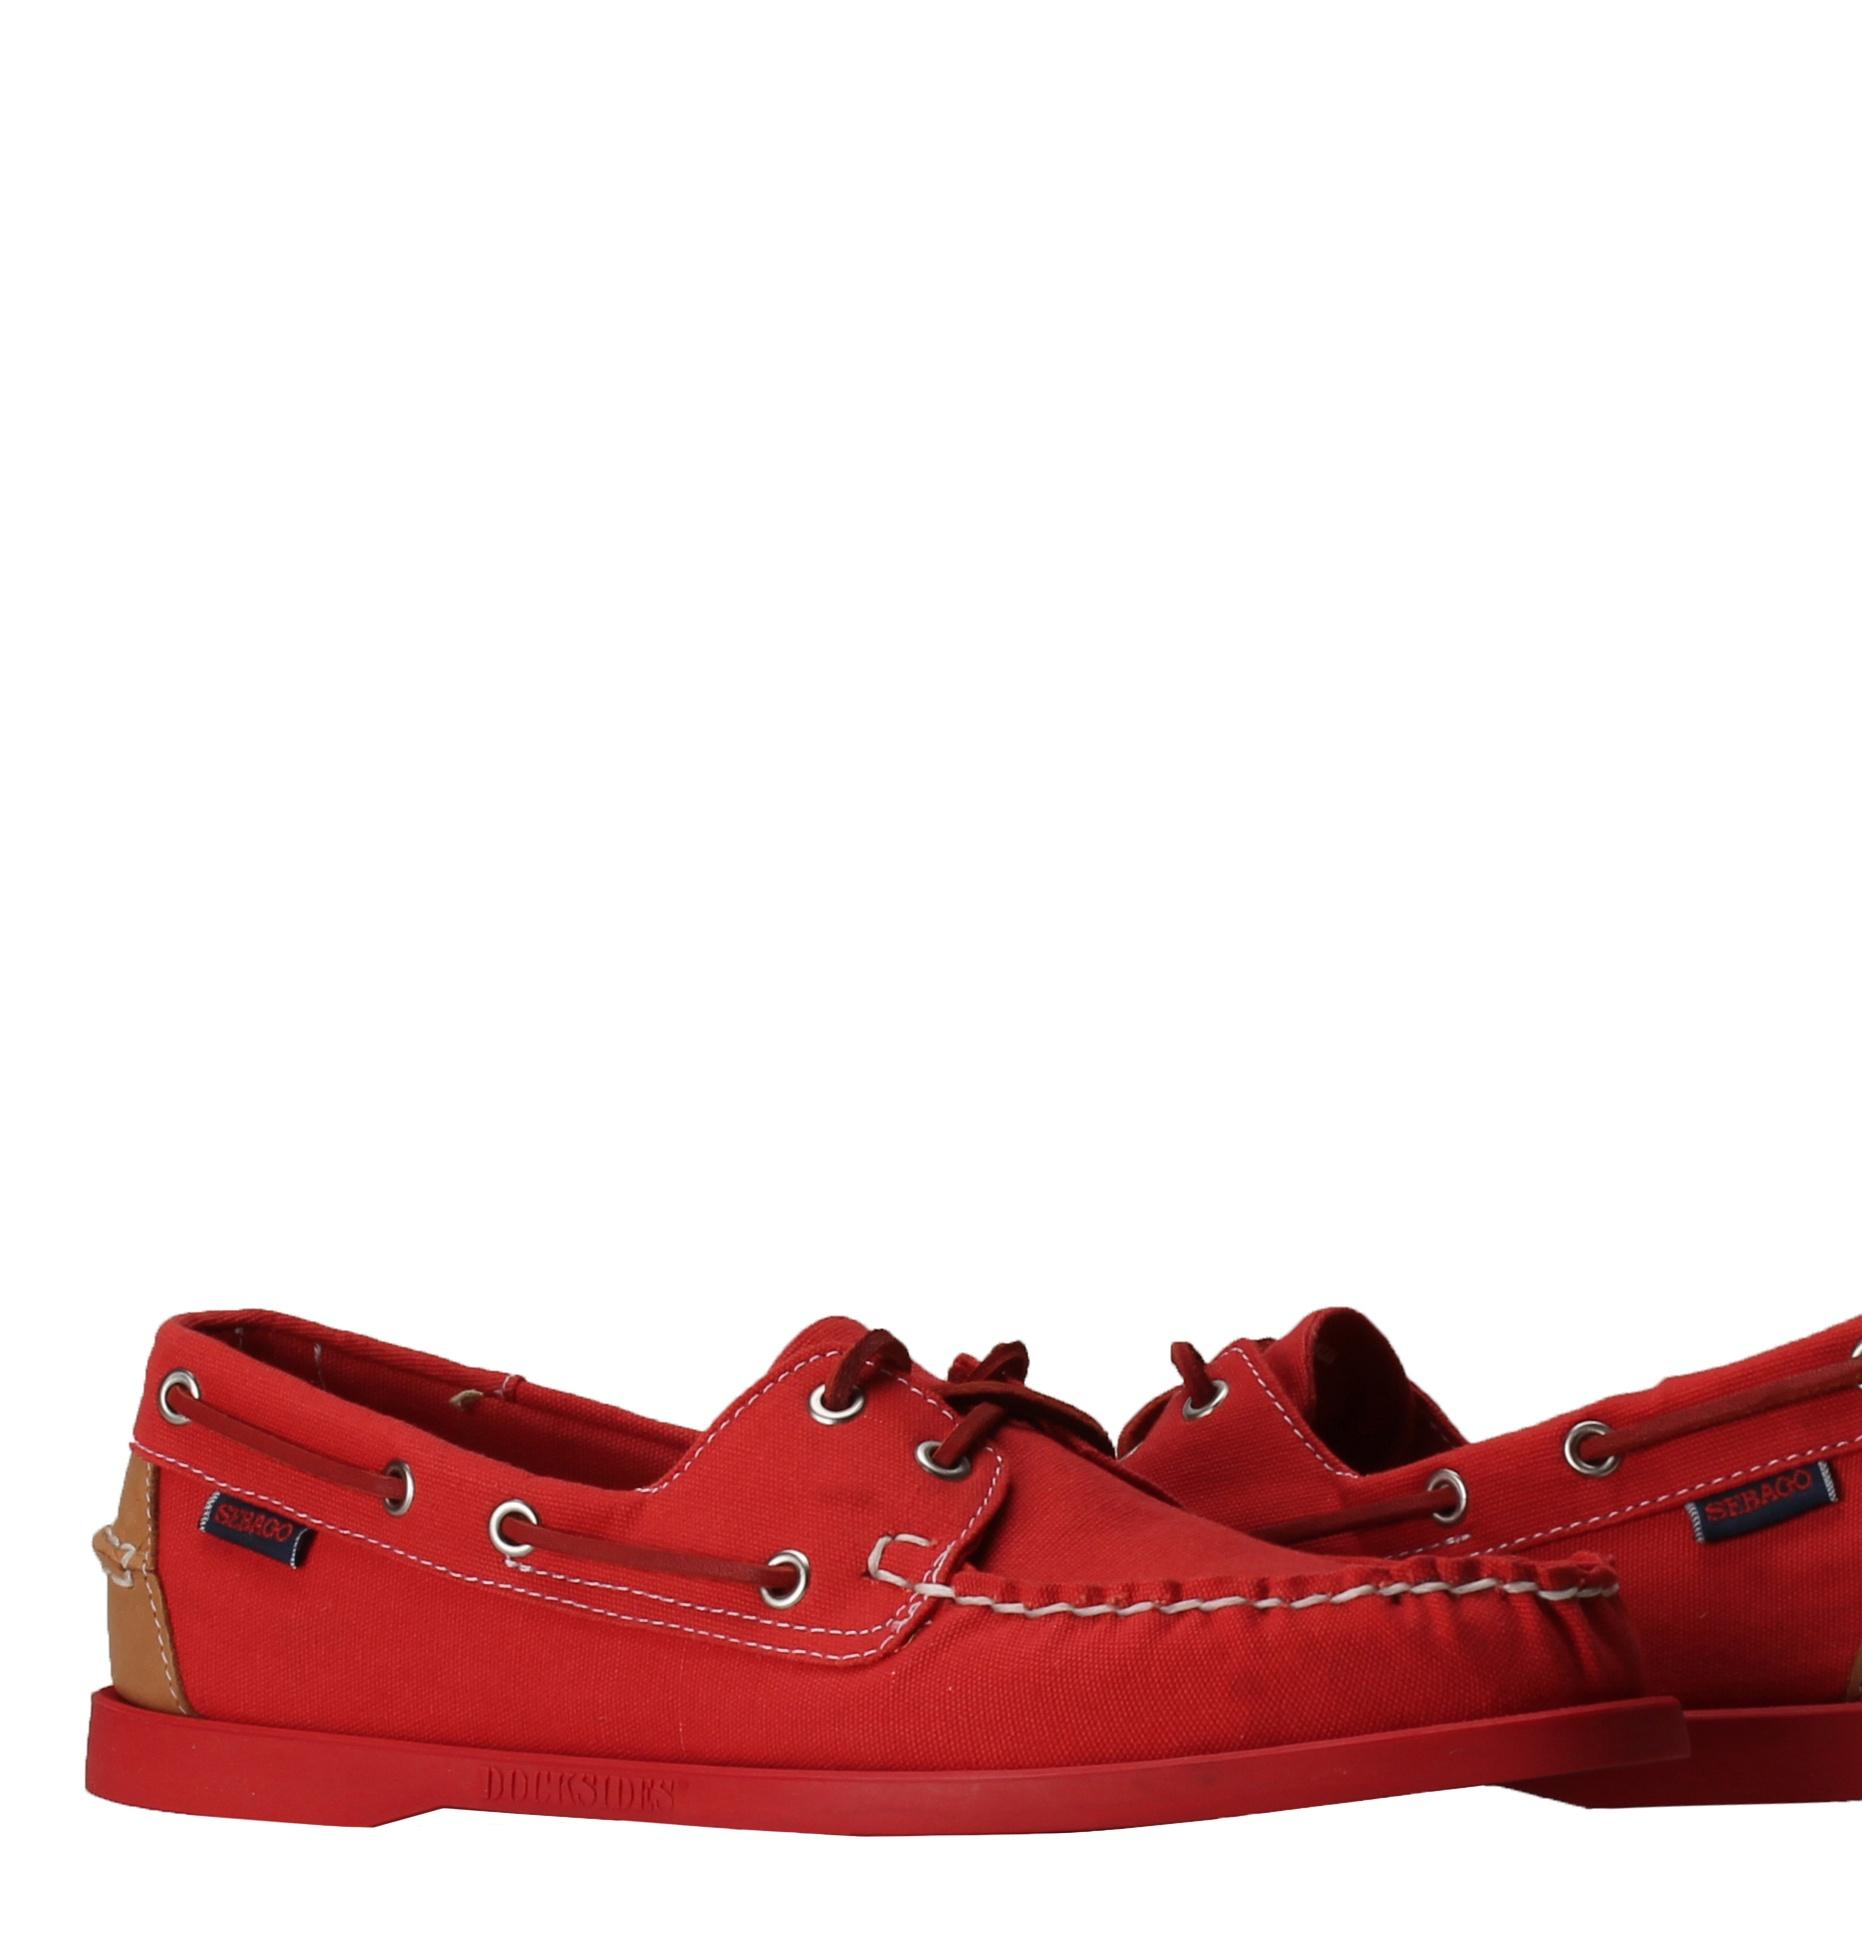 Sebago Docksides Red Canvas Tan Leather Men's Boat Shoes B720148 by Sebago